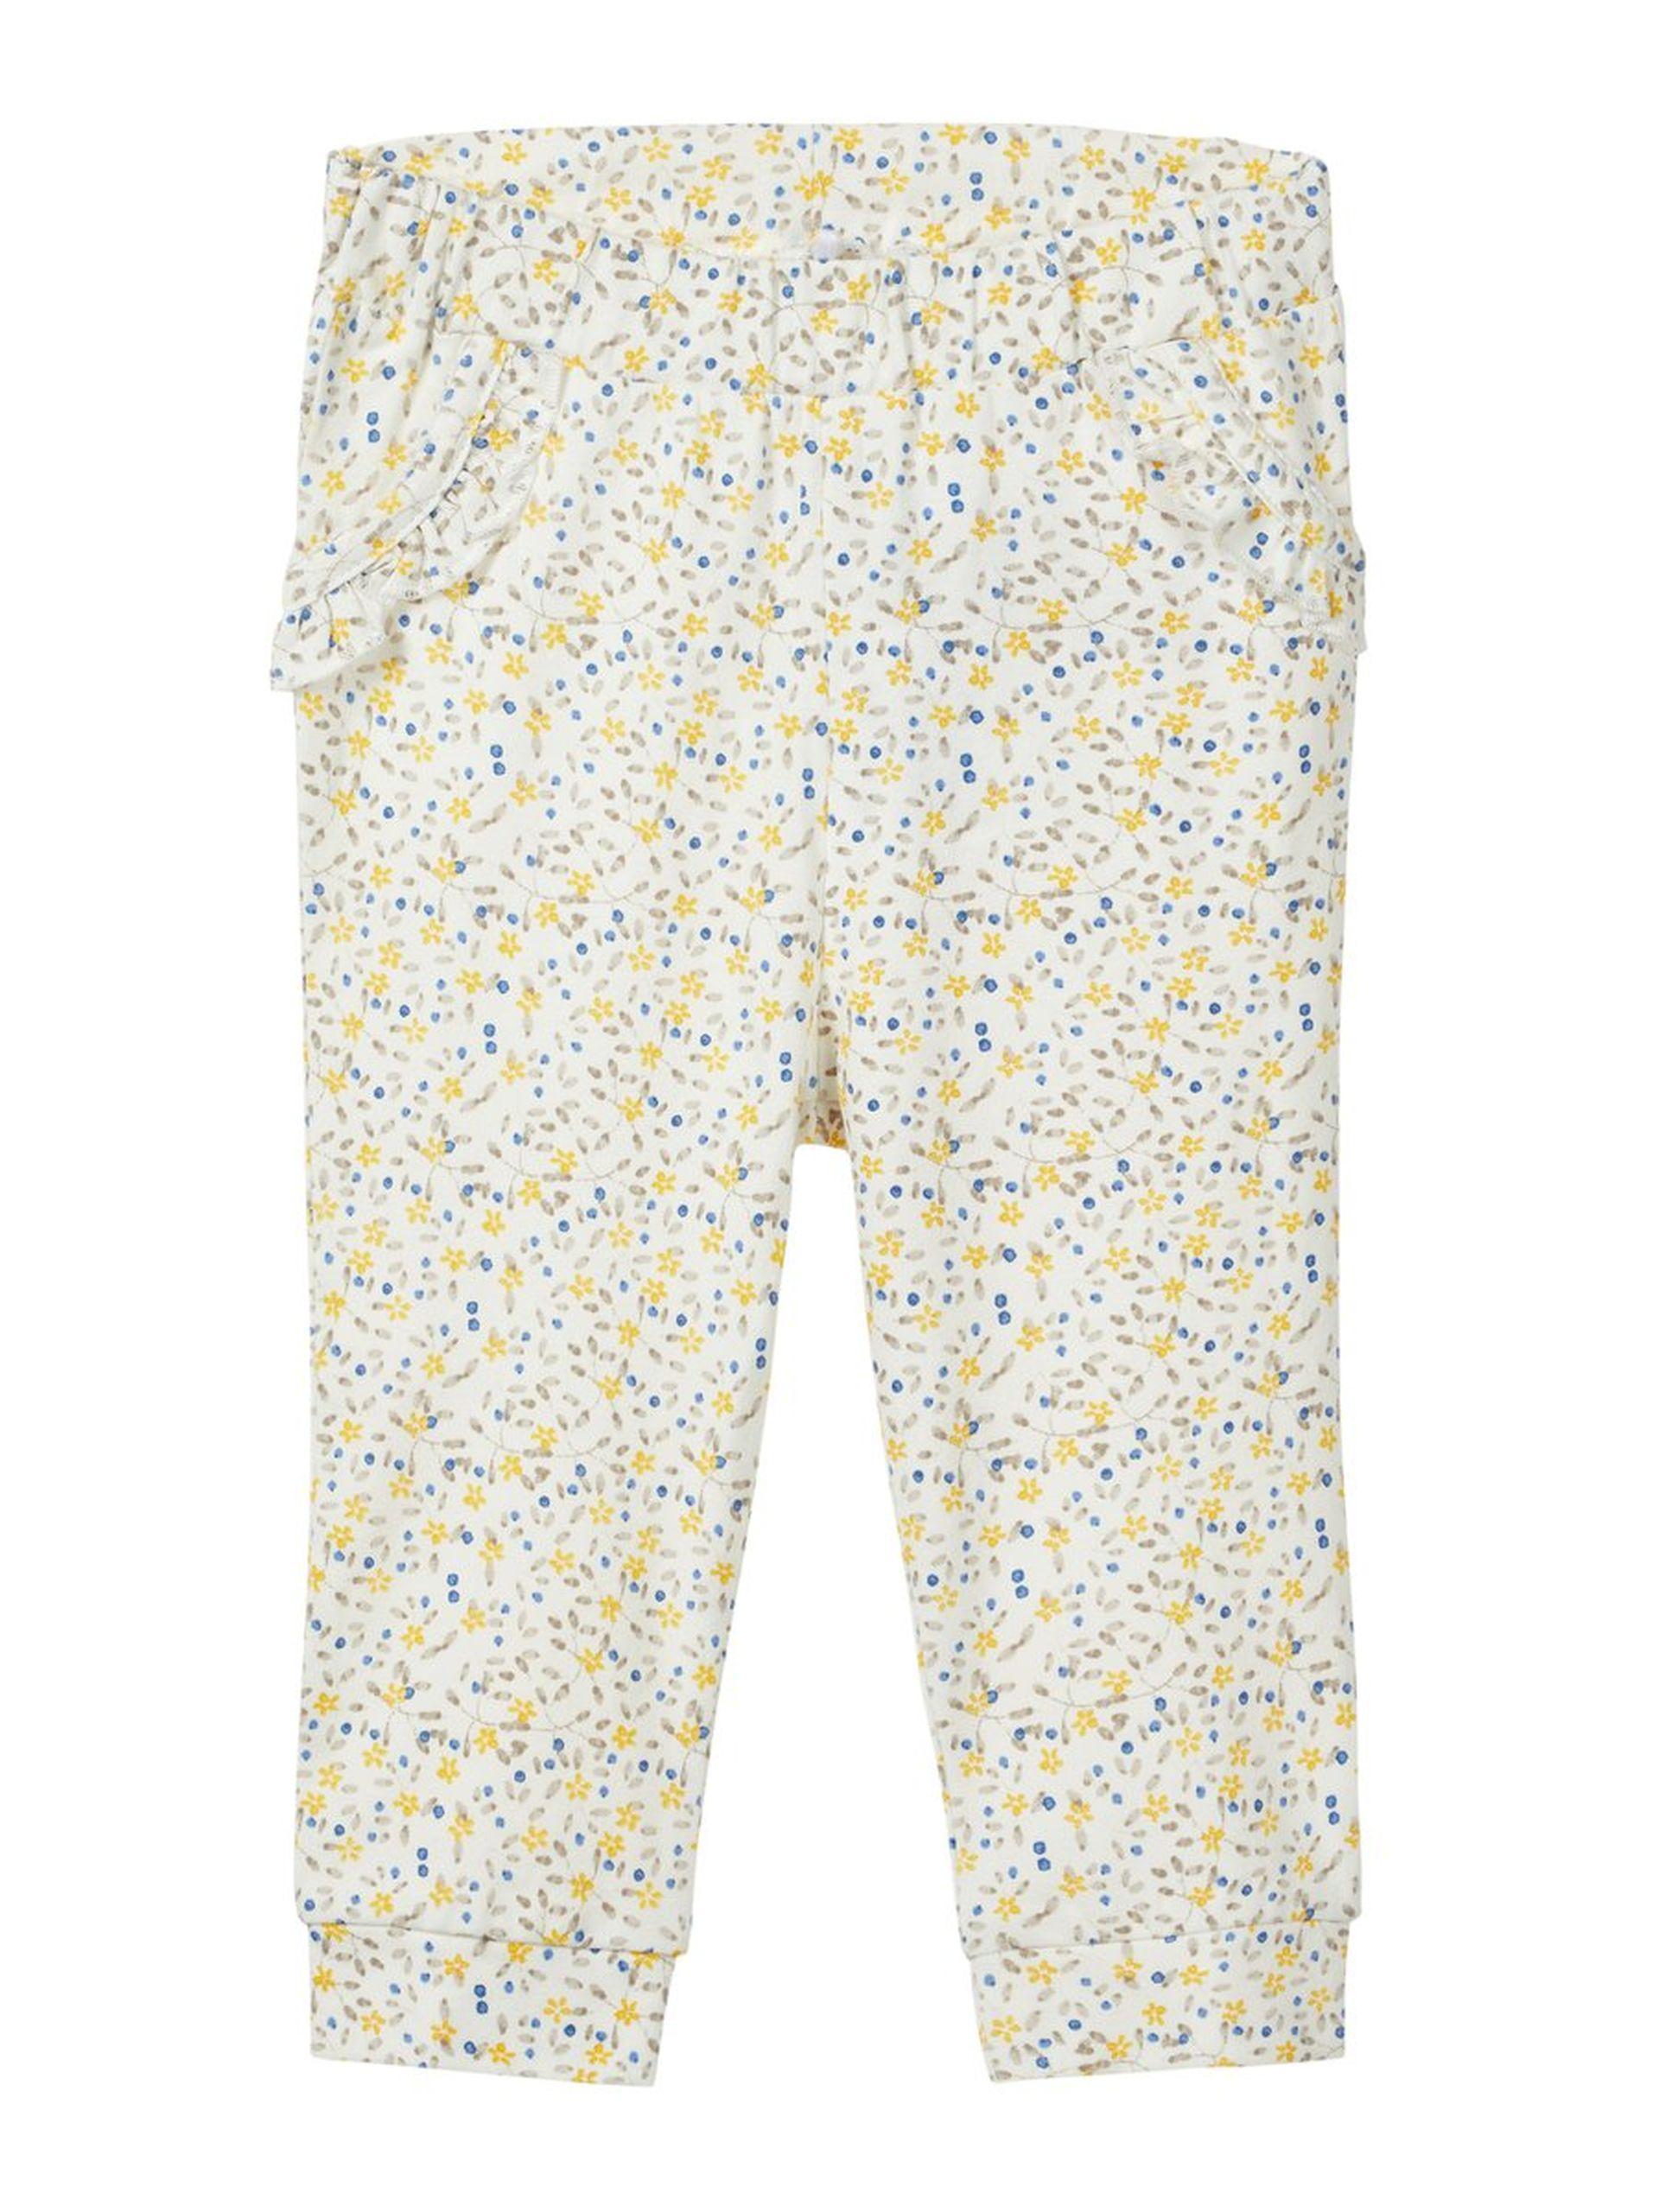 a504b4e4 Name It bukse blomster – Name It off white bukse med blomster – Mio Trend